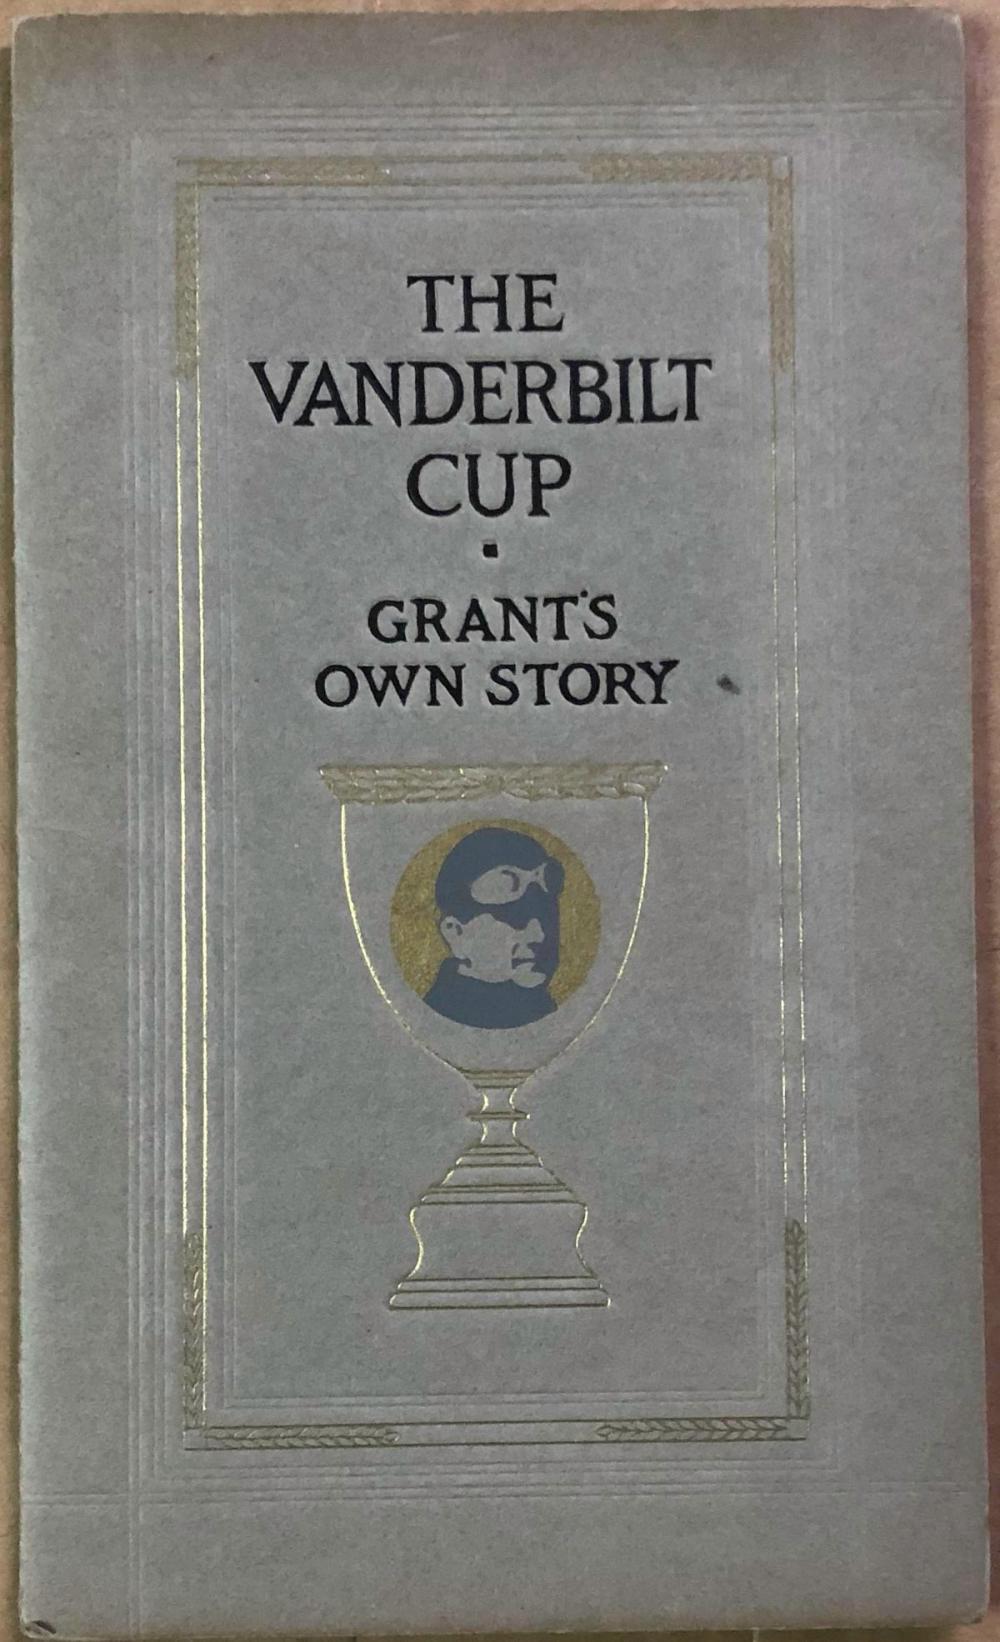 Vanderbilt Cup - 1911 Alco driver Grant's Own Stor